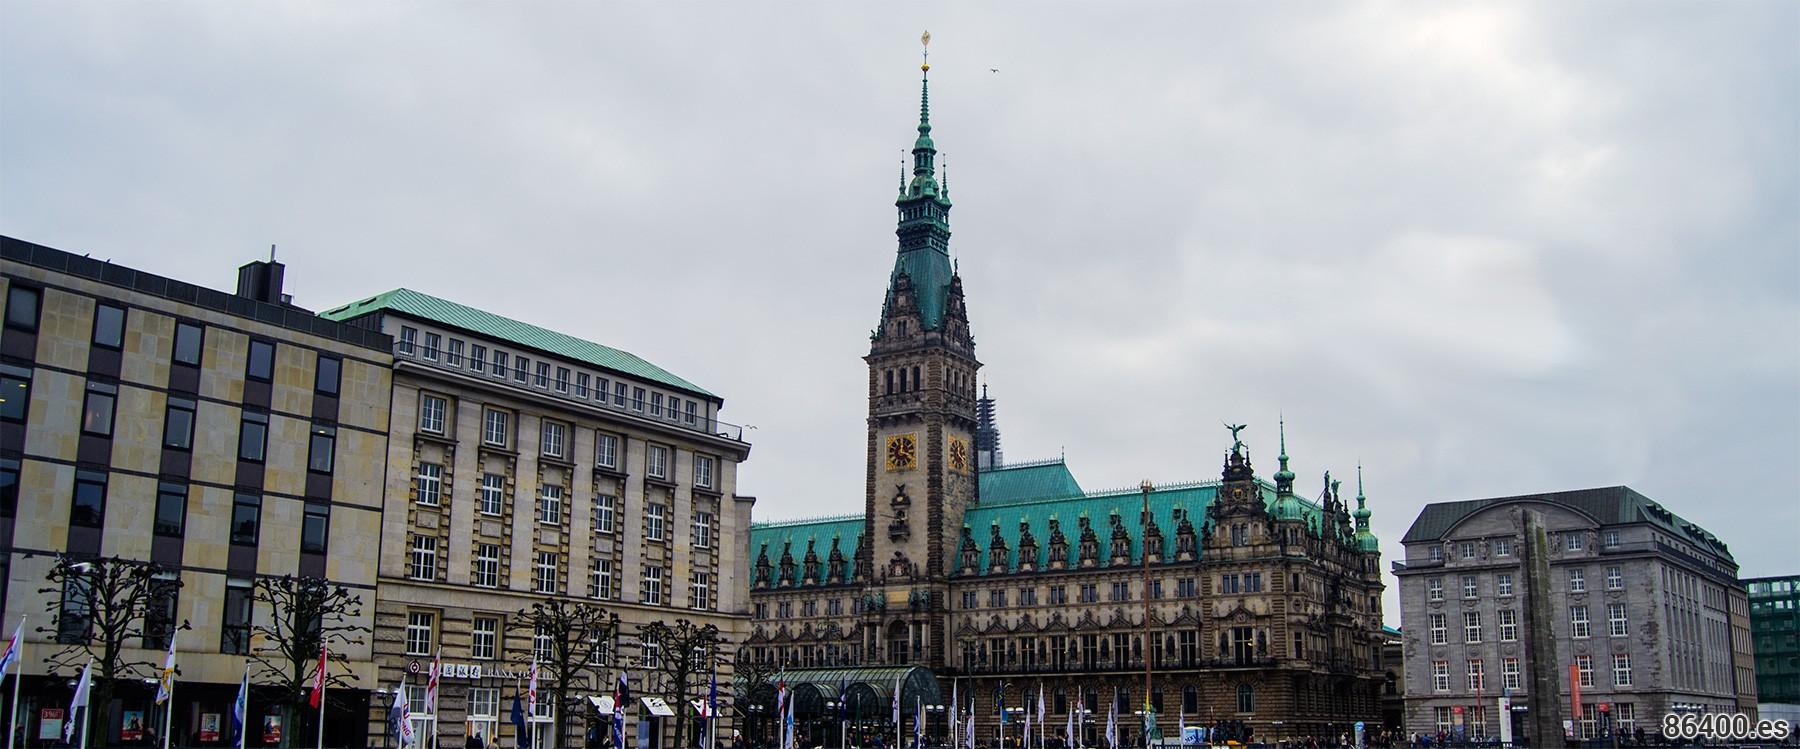 Hamburgo, guía útil para turistas